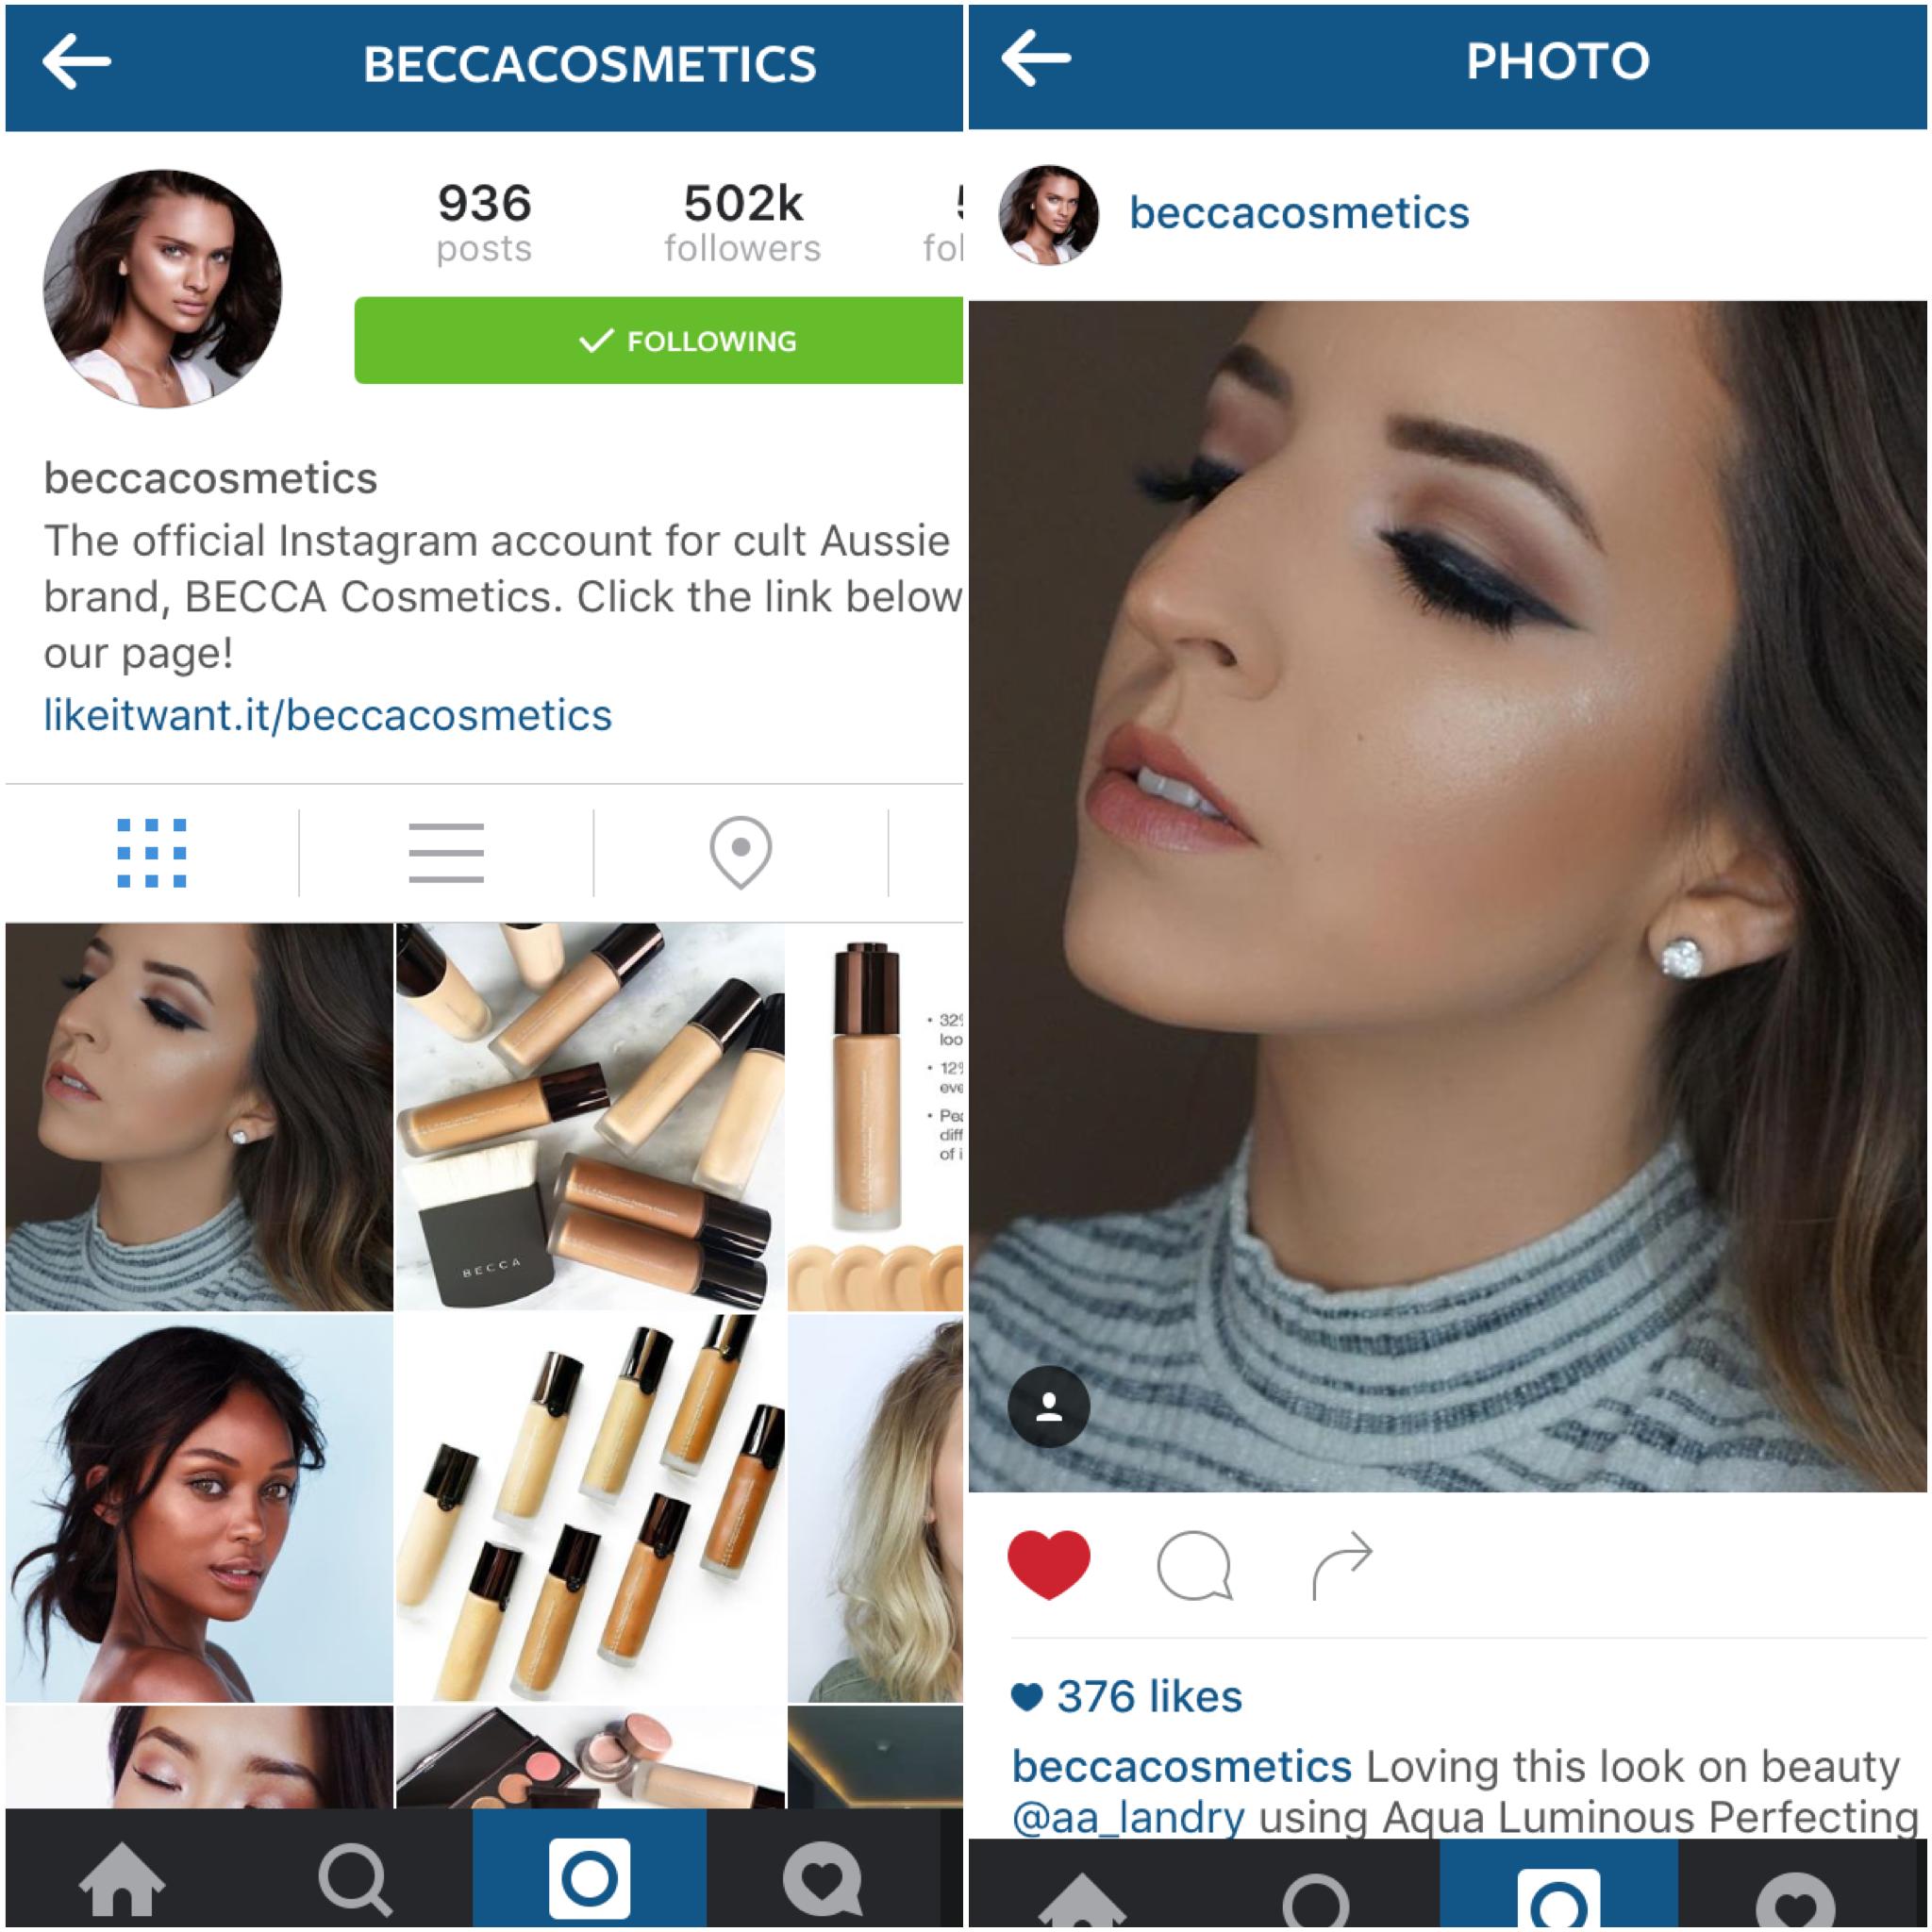 BECCA Cosmetics Instagram Feature